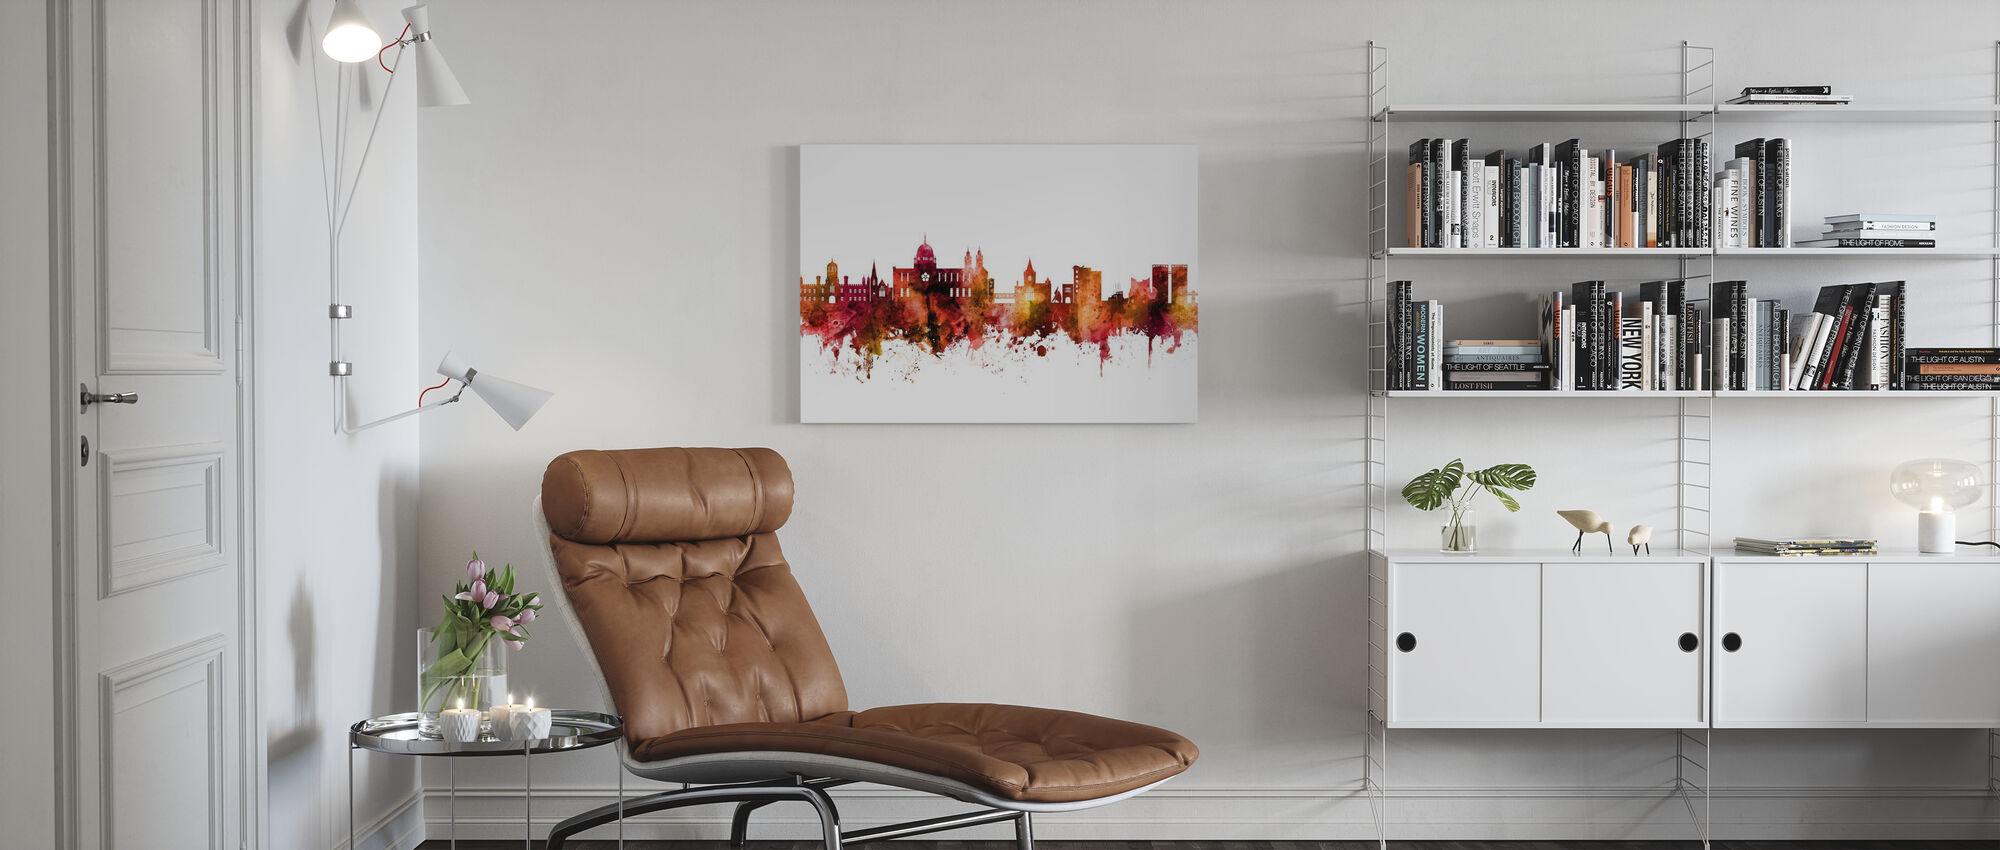 Galway Ireland Skyline - Canvas print - Living Room